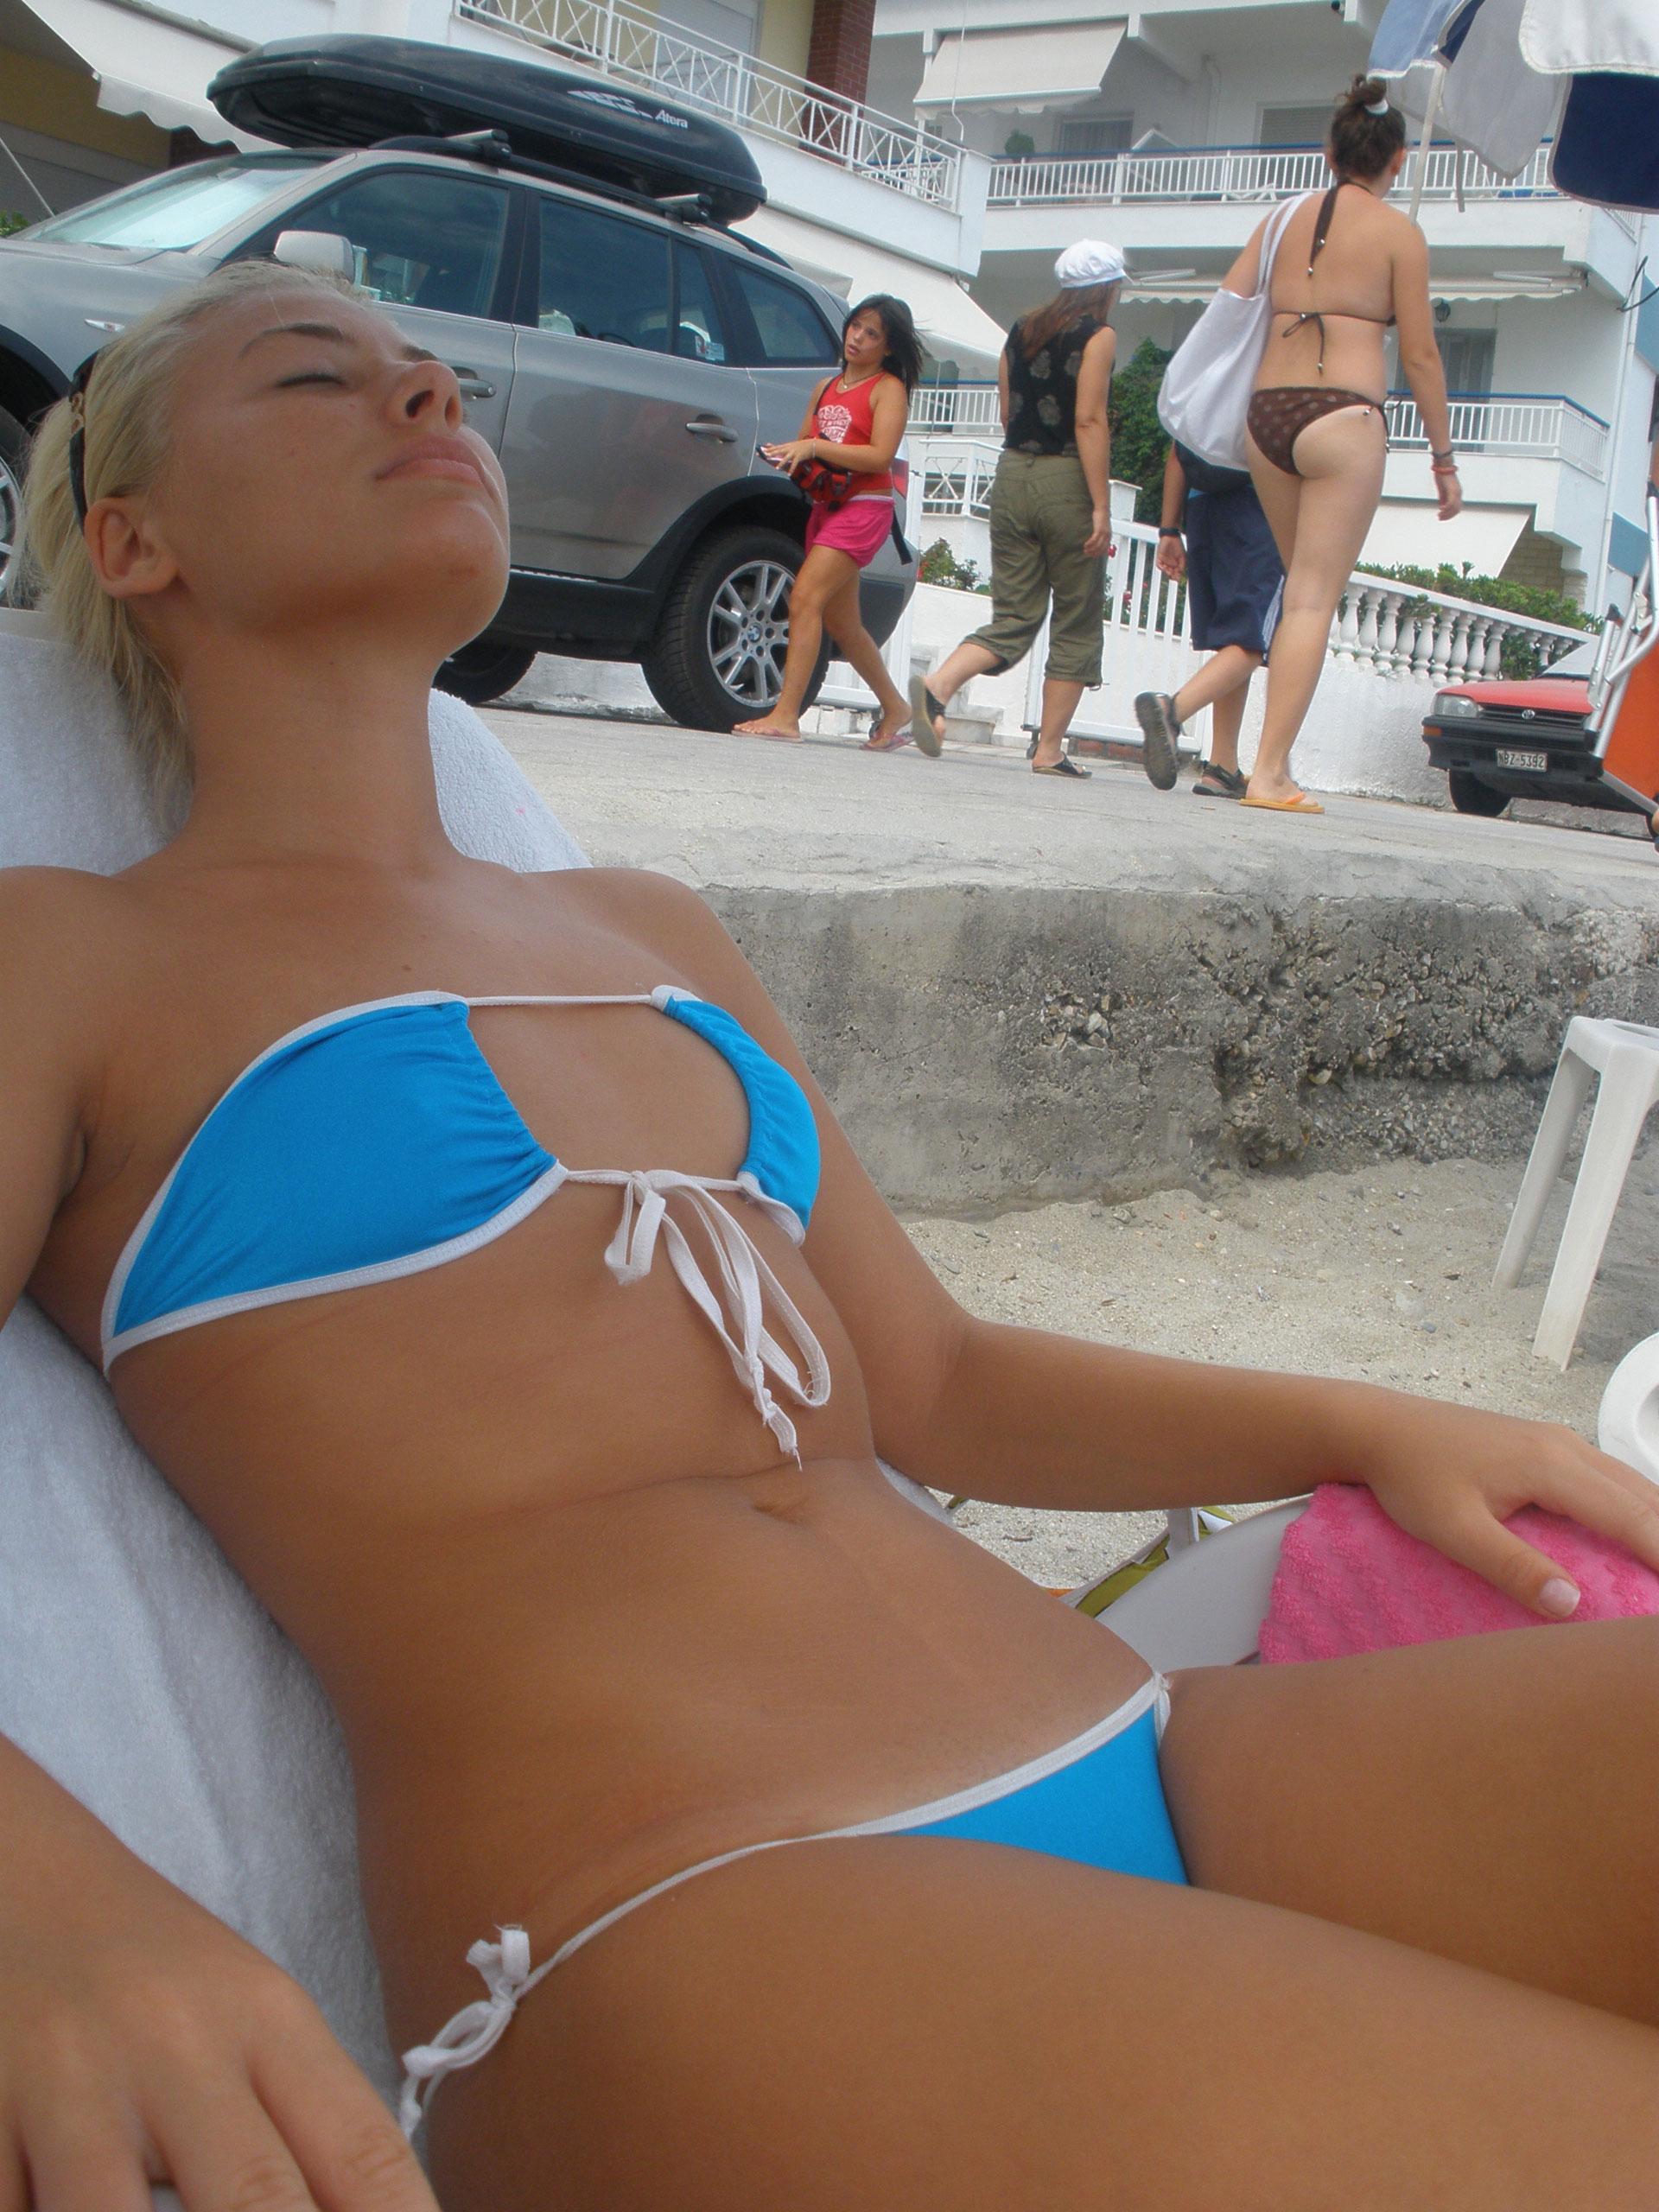 Irina ioana baiant naked nude (69 photo), Feet Celebrites image